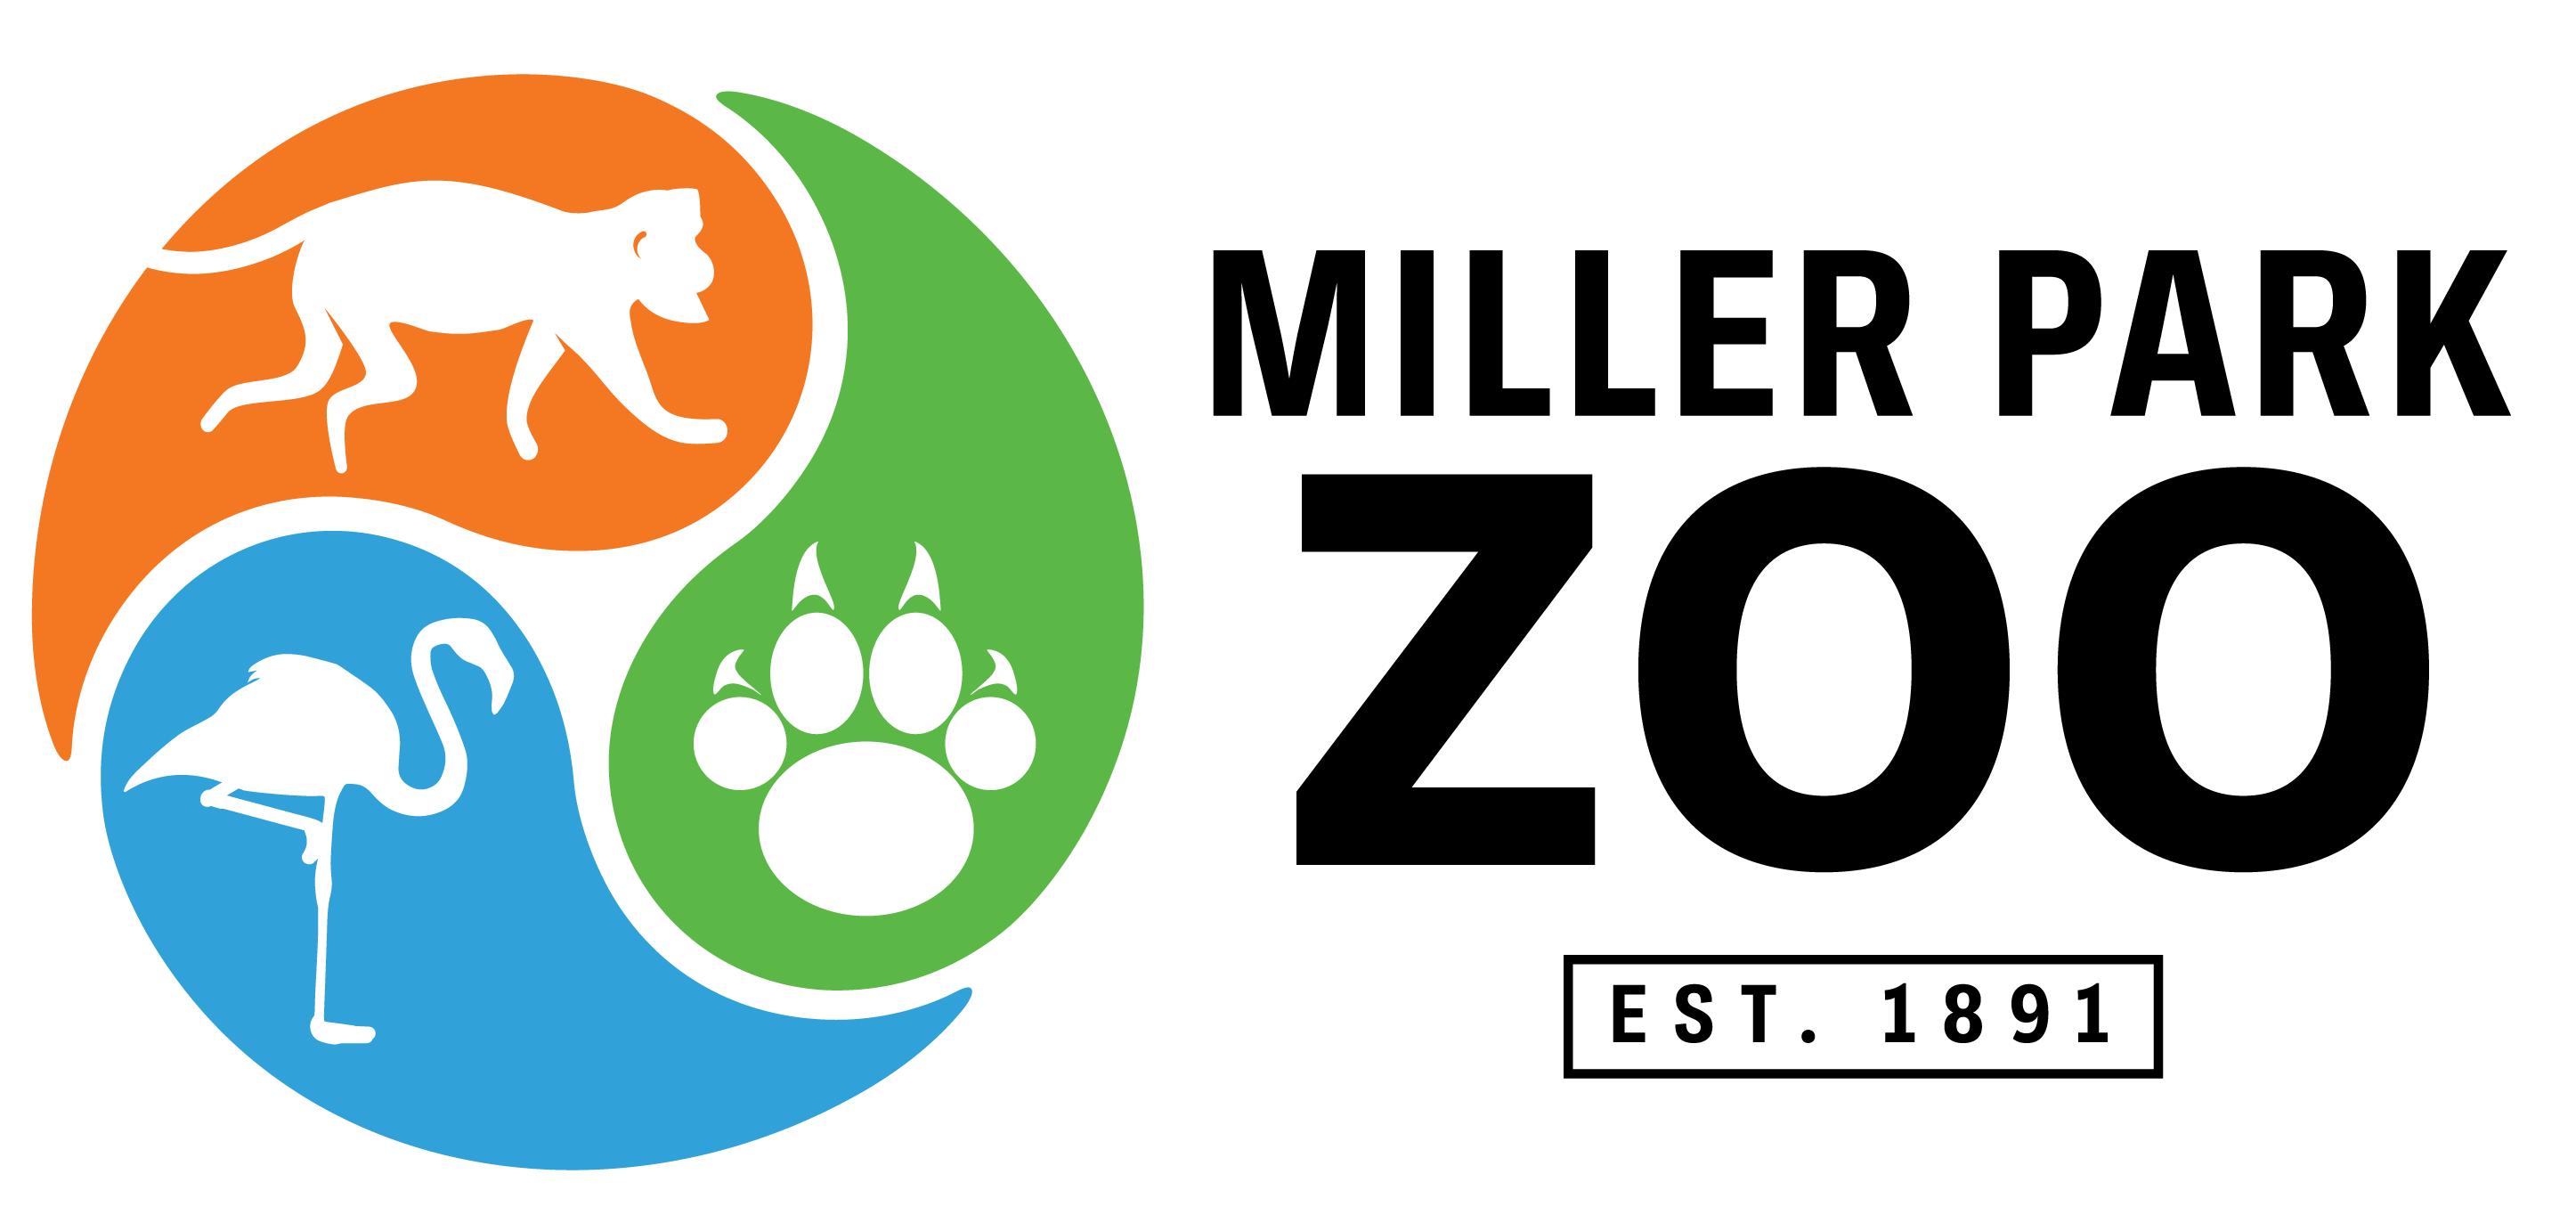 MillerParkZoo-Horizontal_NewLogo_FINAL_HIRES